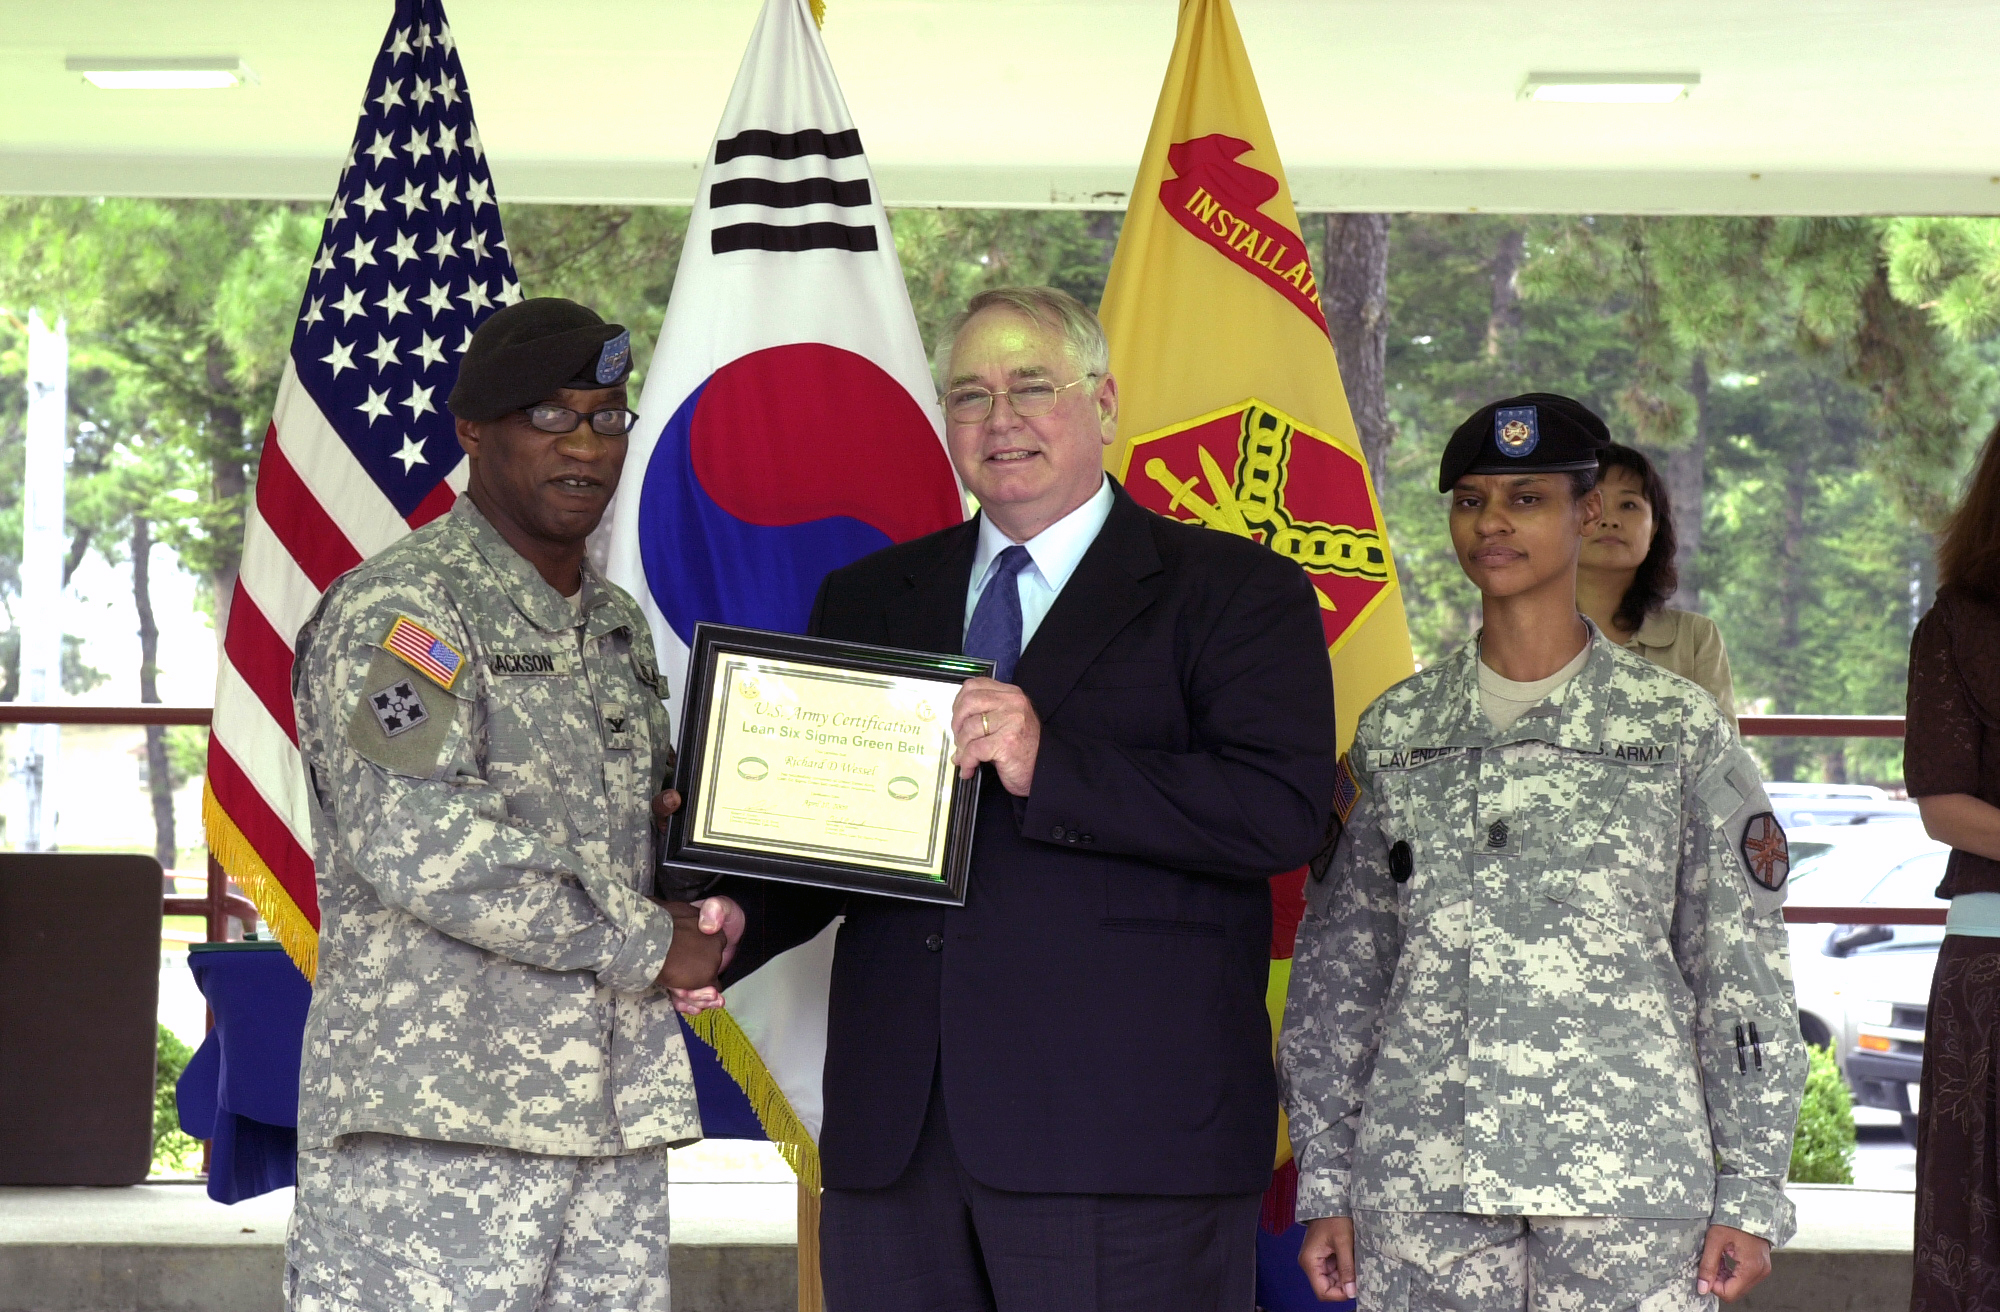 Fileus Army 52848 Usag Rc Lean Sigma Green Belt Award Ceremony On